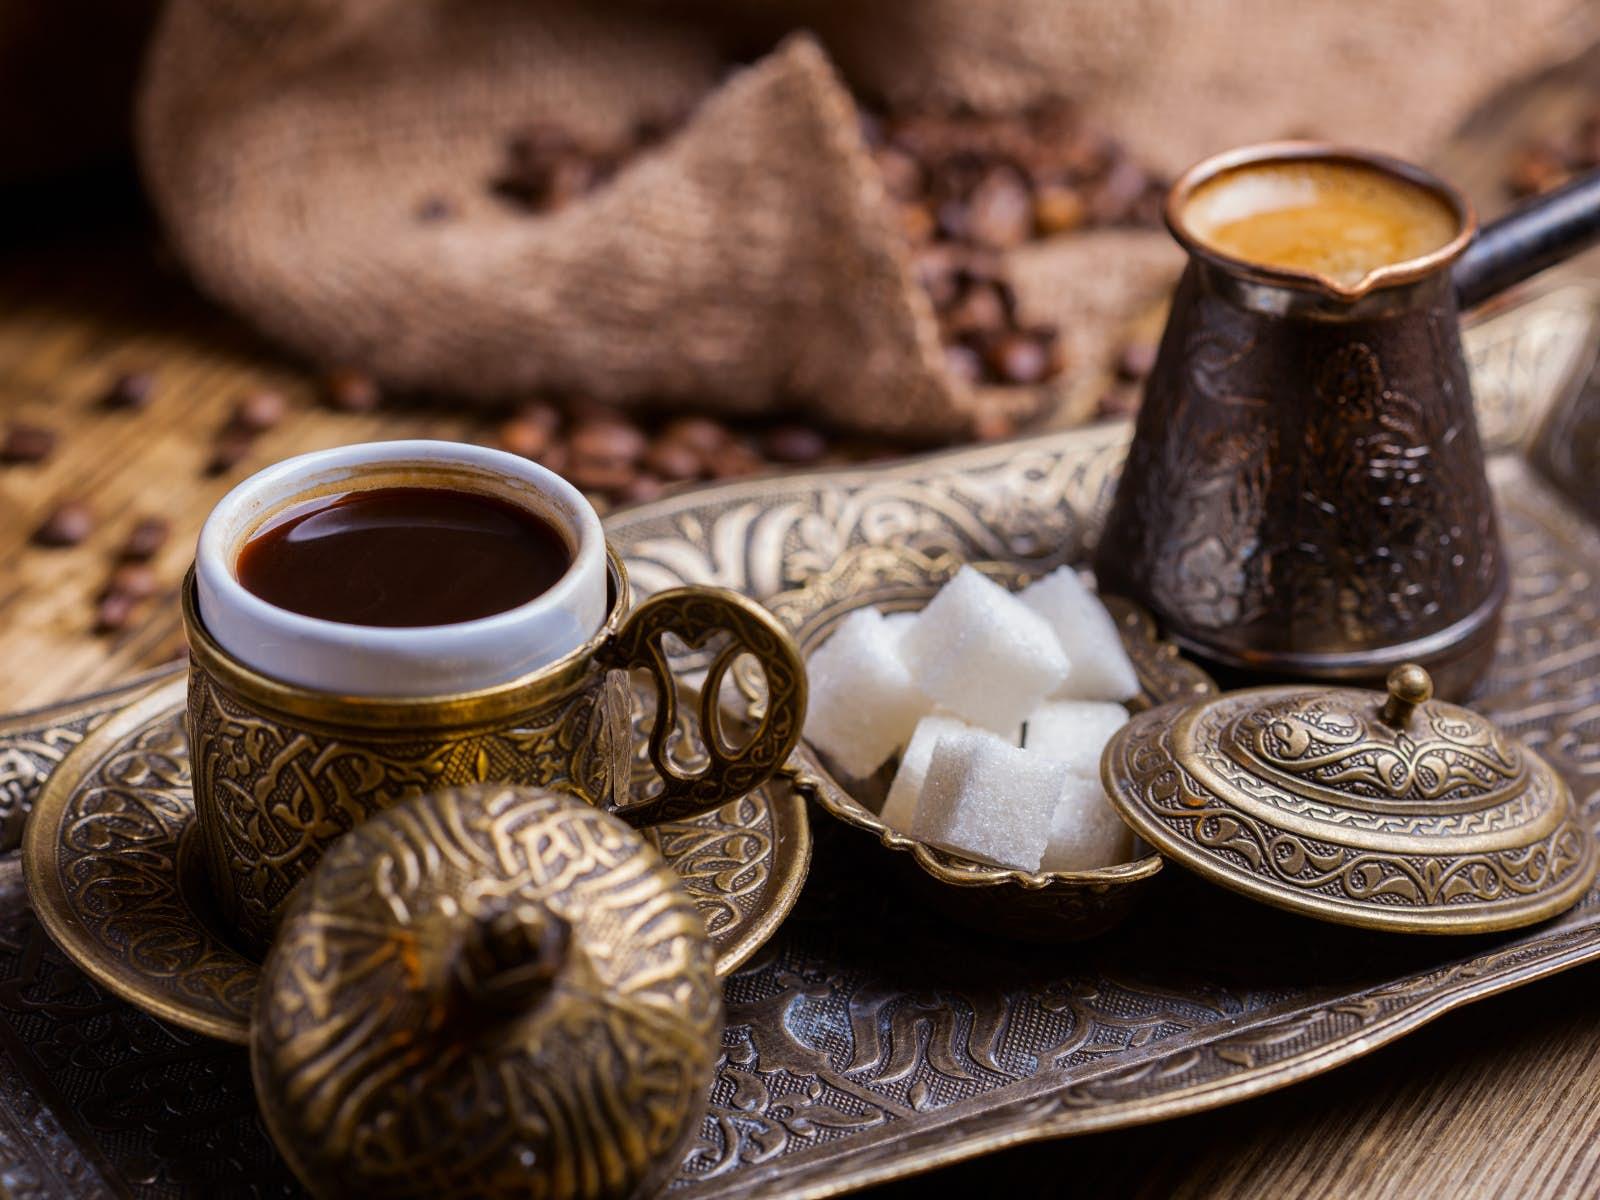 kaffe Dating Sites Bangalore gratis online dating sites